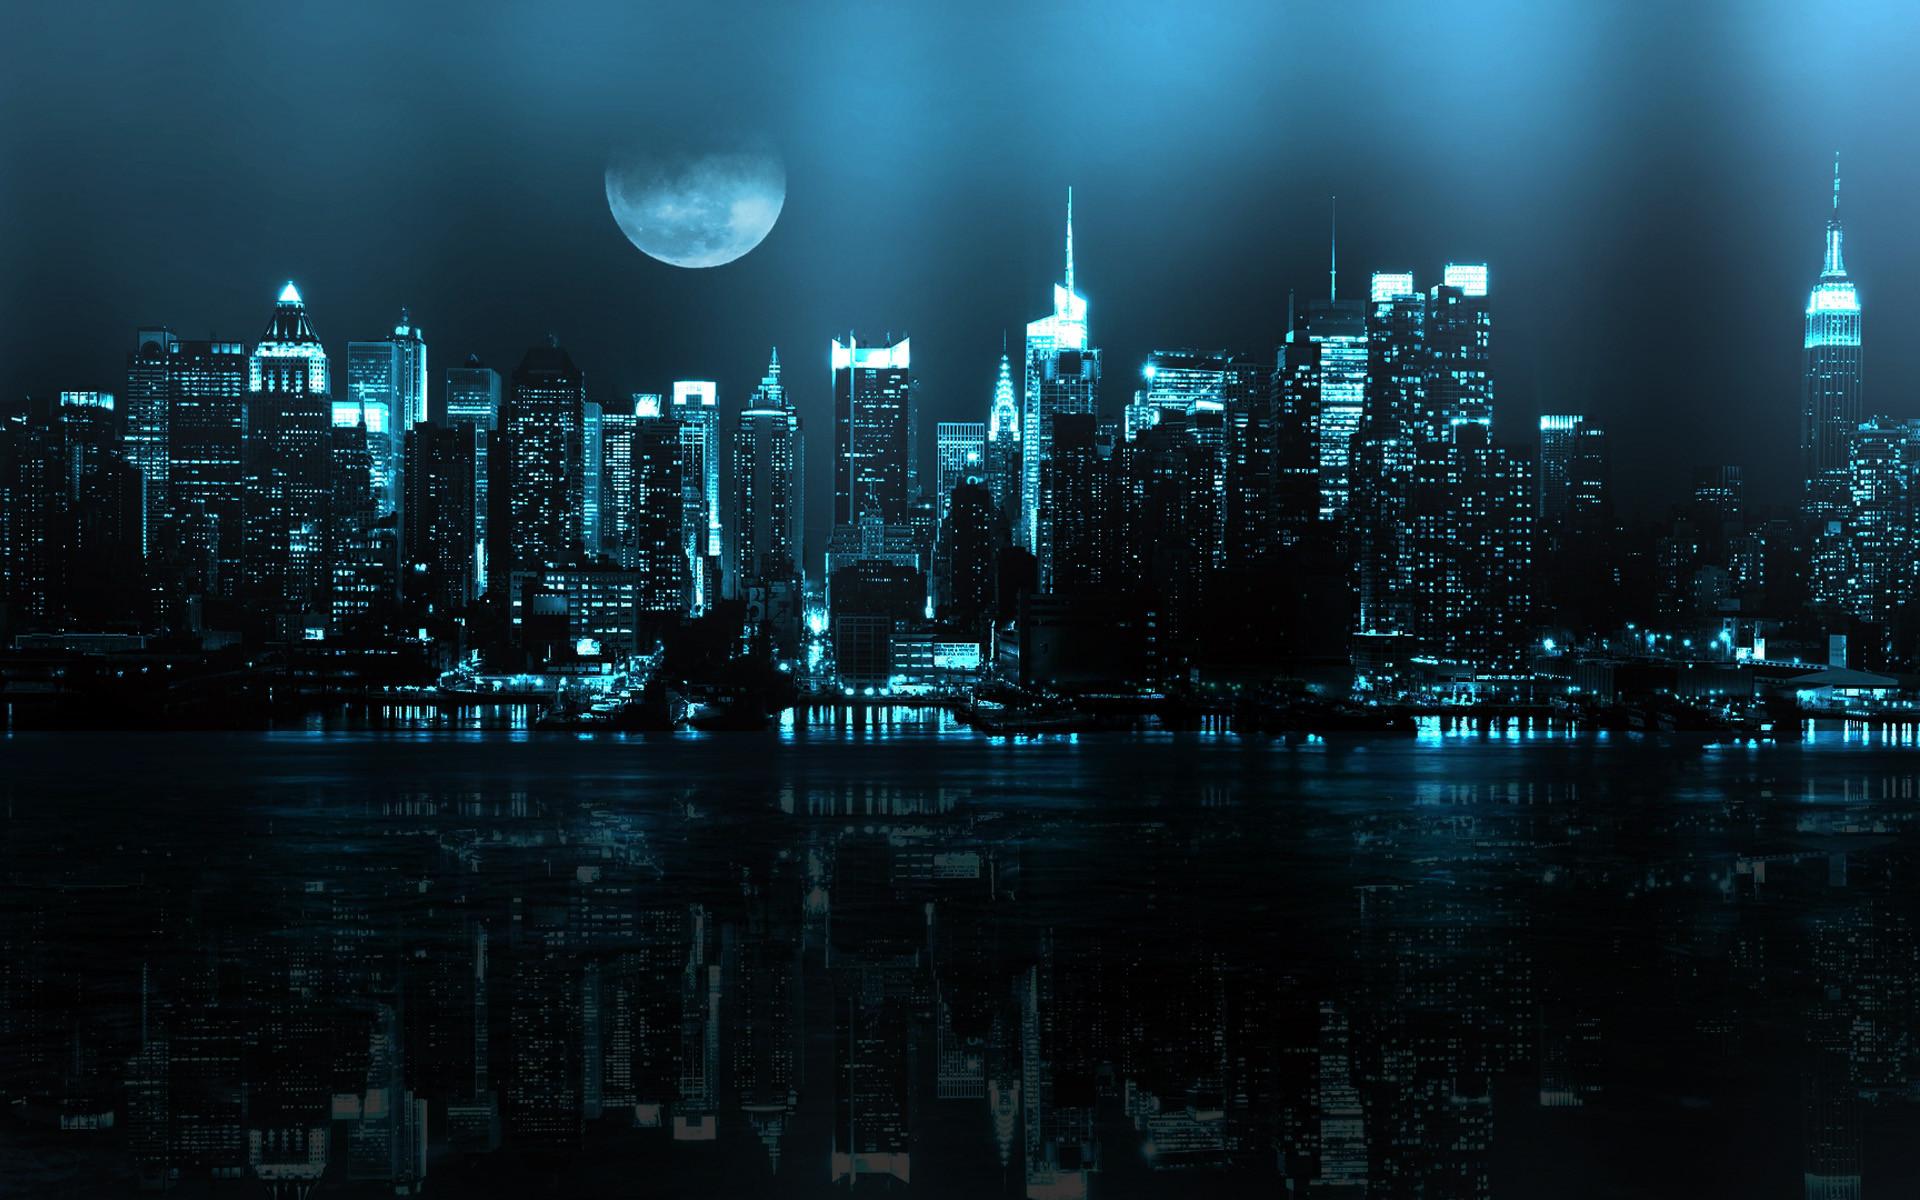 New York At Night wallpaper